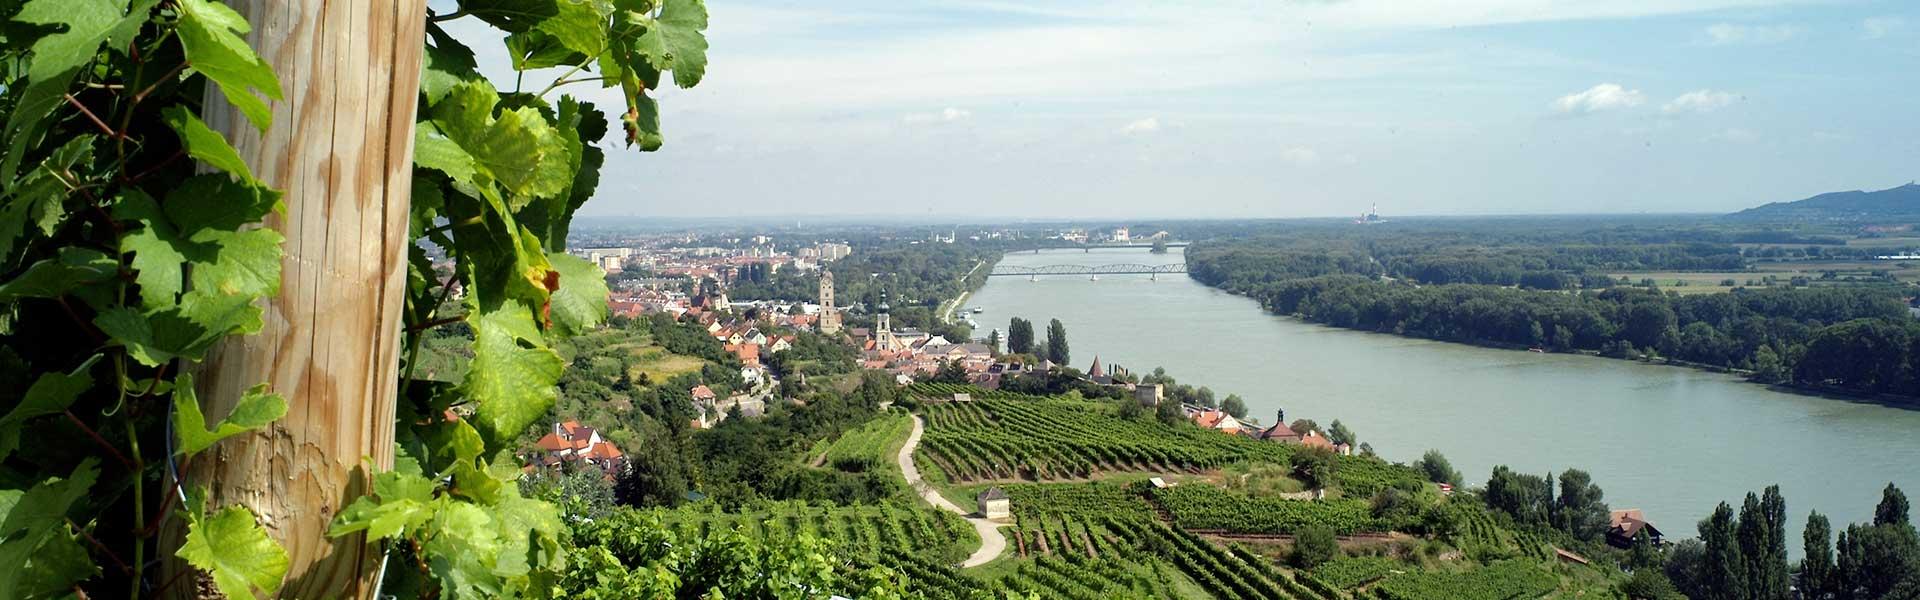 Donauwirt Slide Donau